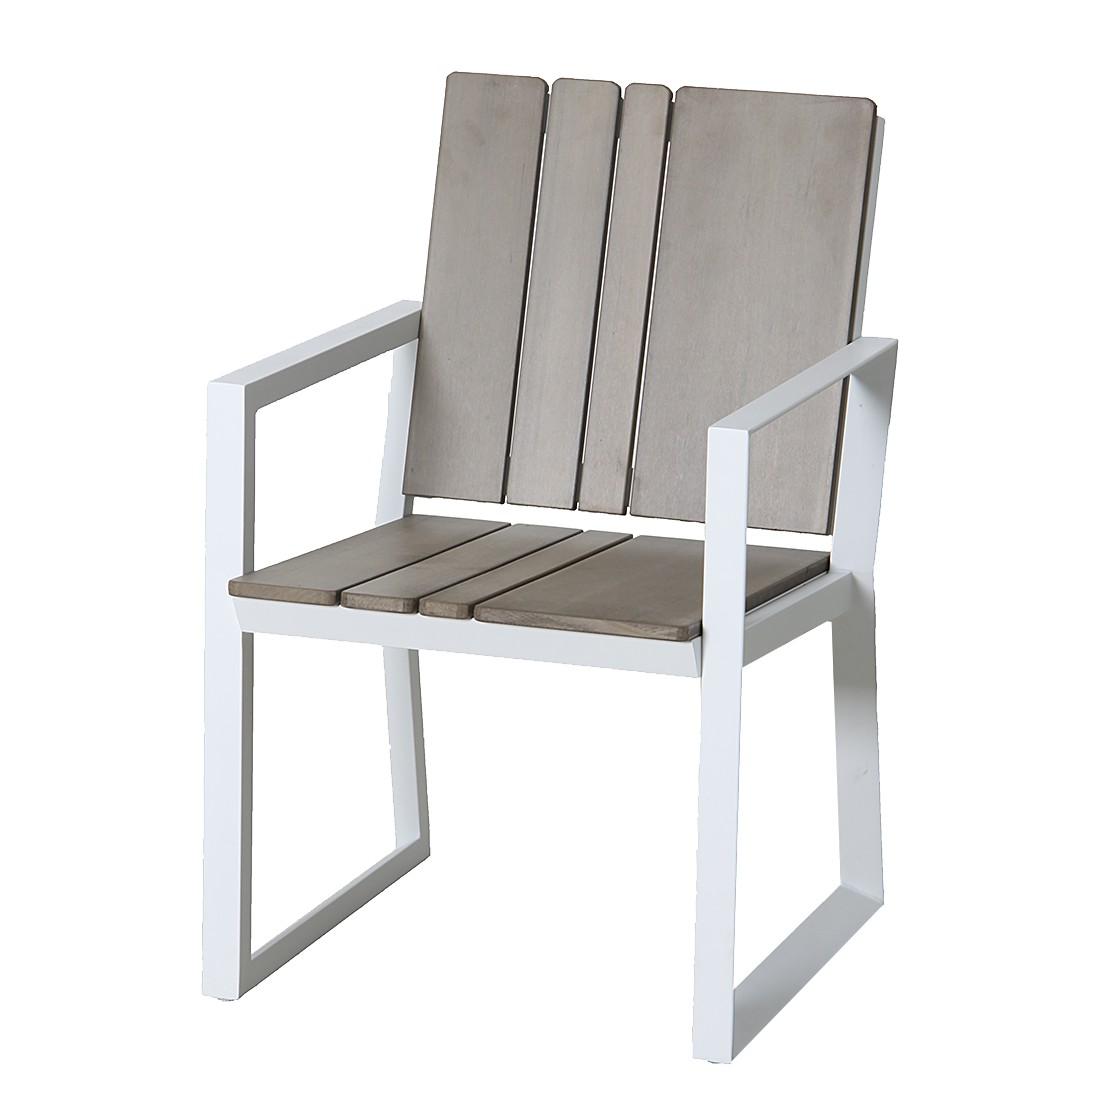 Gartenstuhl Escape (2er-Set) – Aluminium/Kunststoff – Weiß/Grau-Braun, Leco günstig